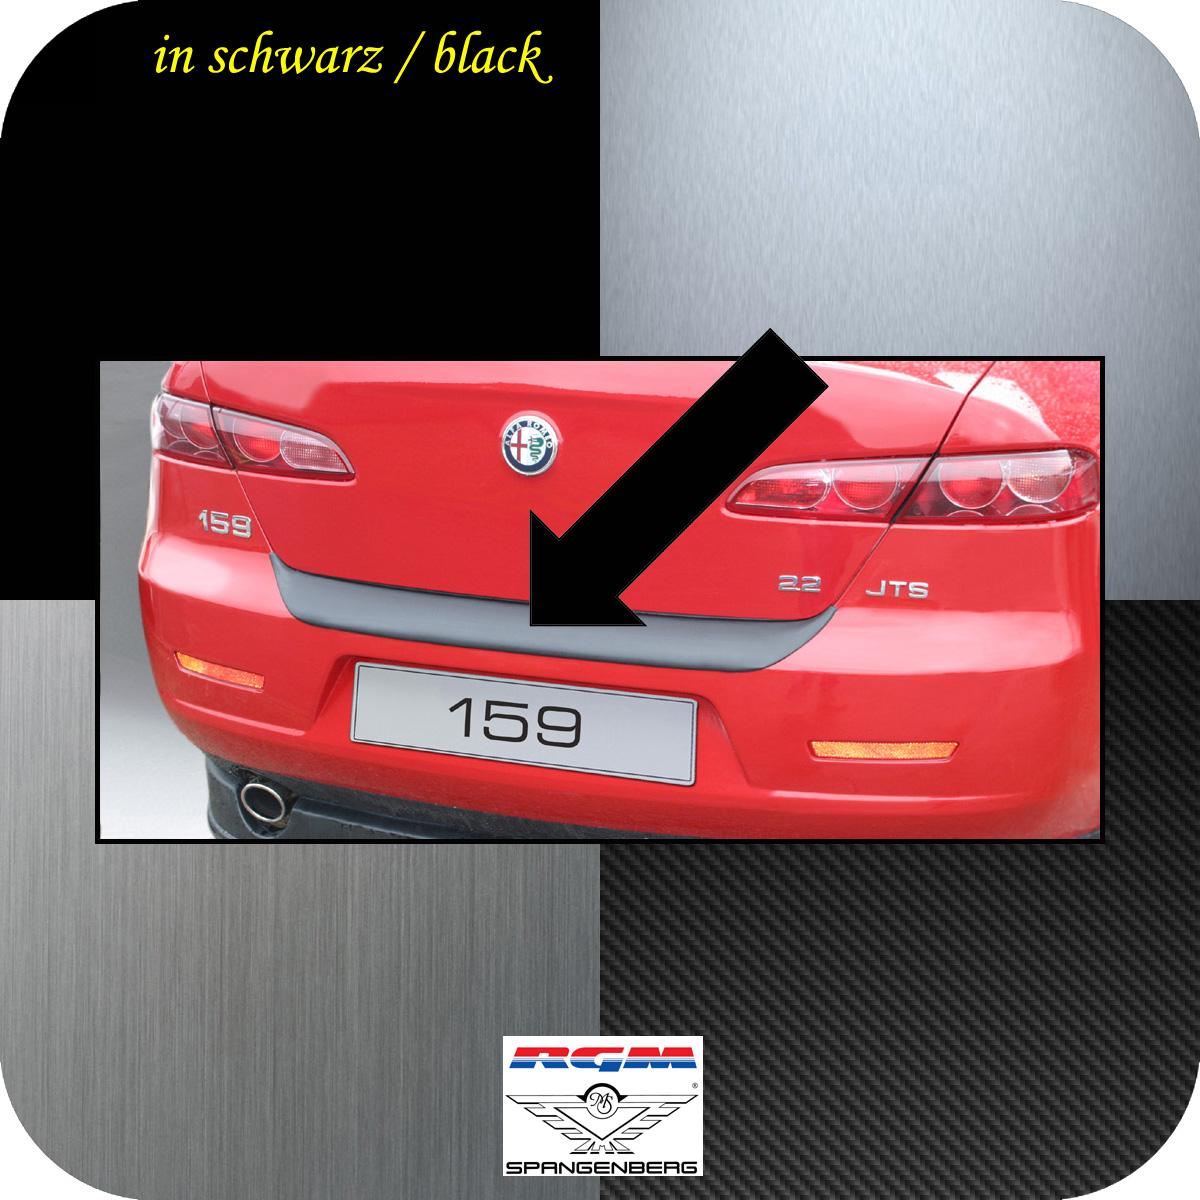 Ladekantenschutz schwarz Alfa Romeo 159 Limousine 4-Türer 2005-11 3500131